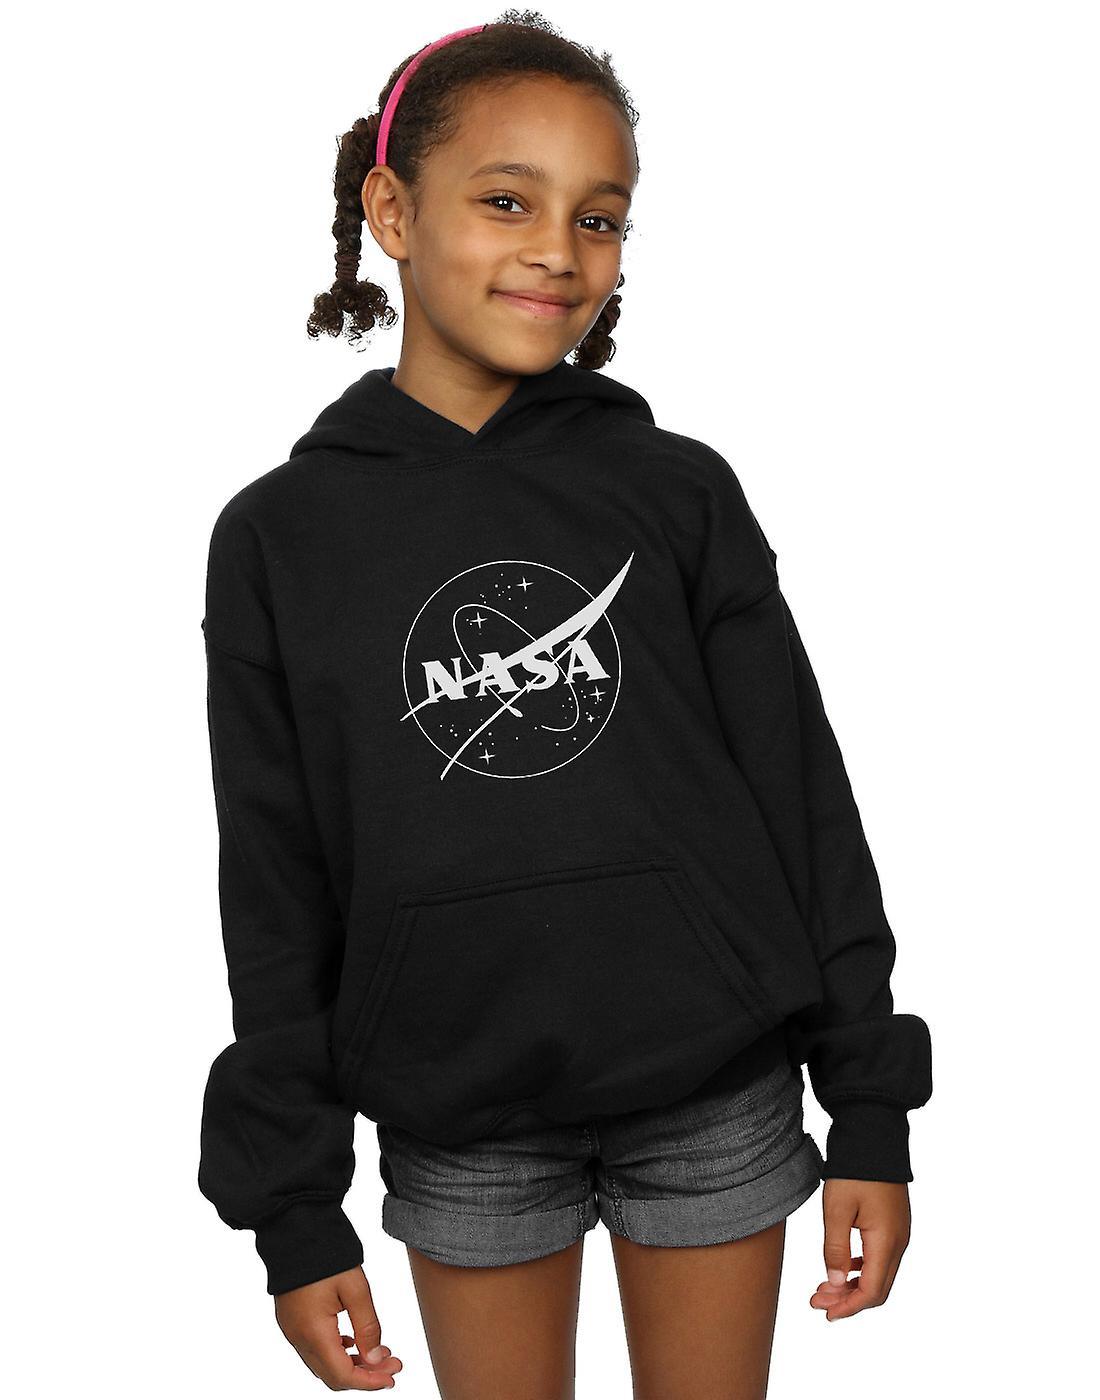 La NASA filles insigne classique Logo Monochrome Hoodie